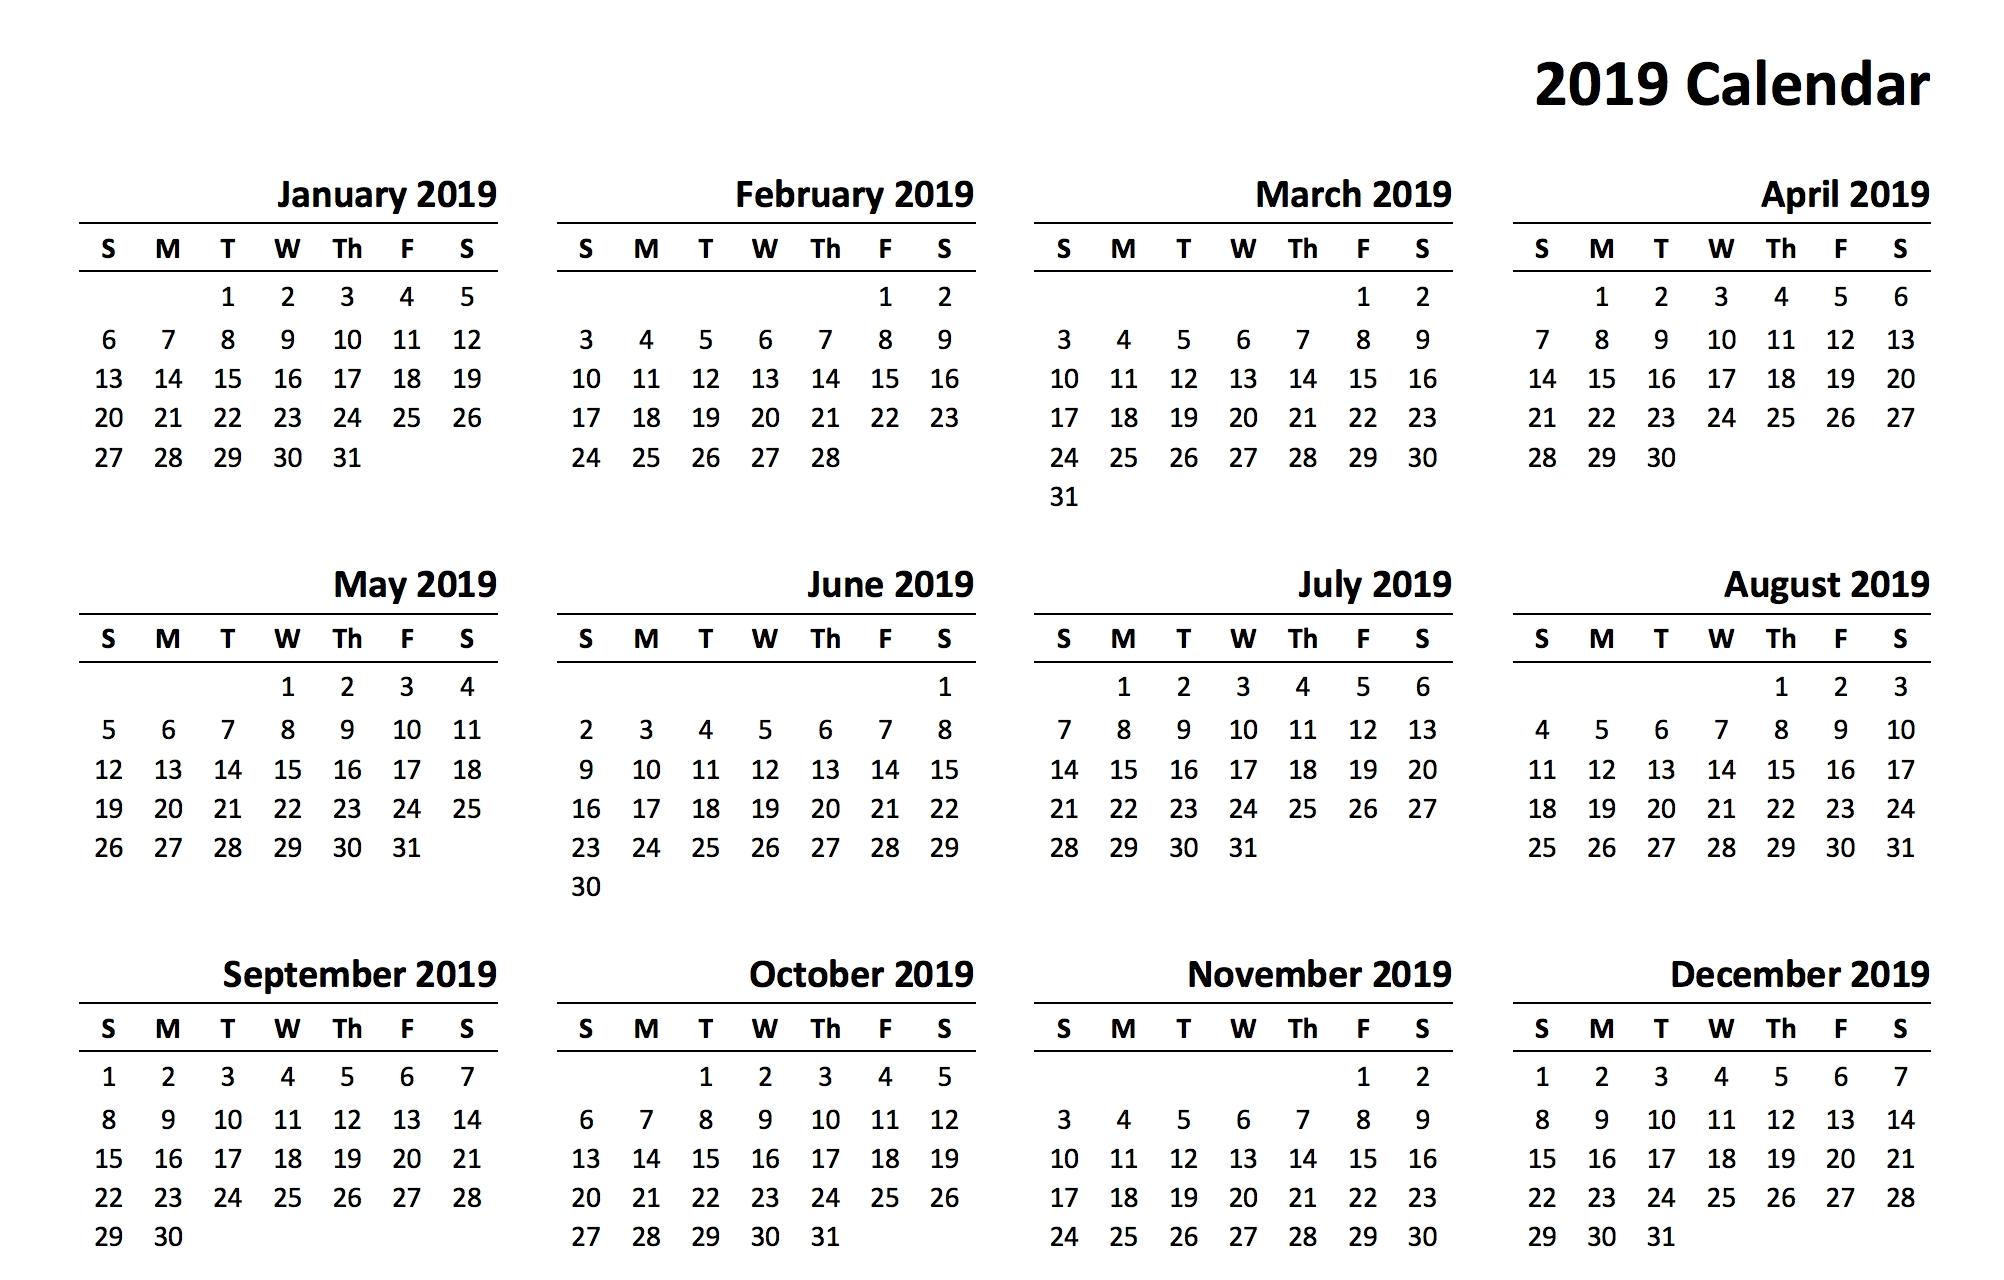 2019 printable calendar templates online::Download 2019 Printable Calendar